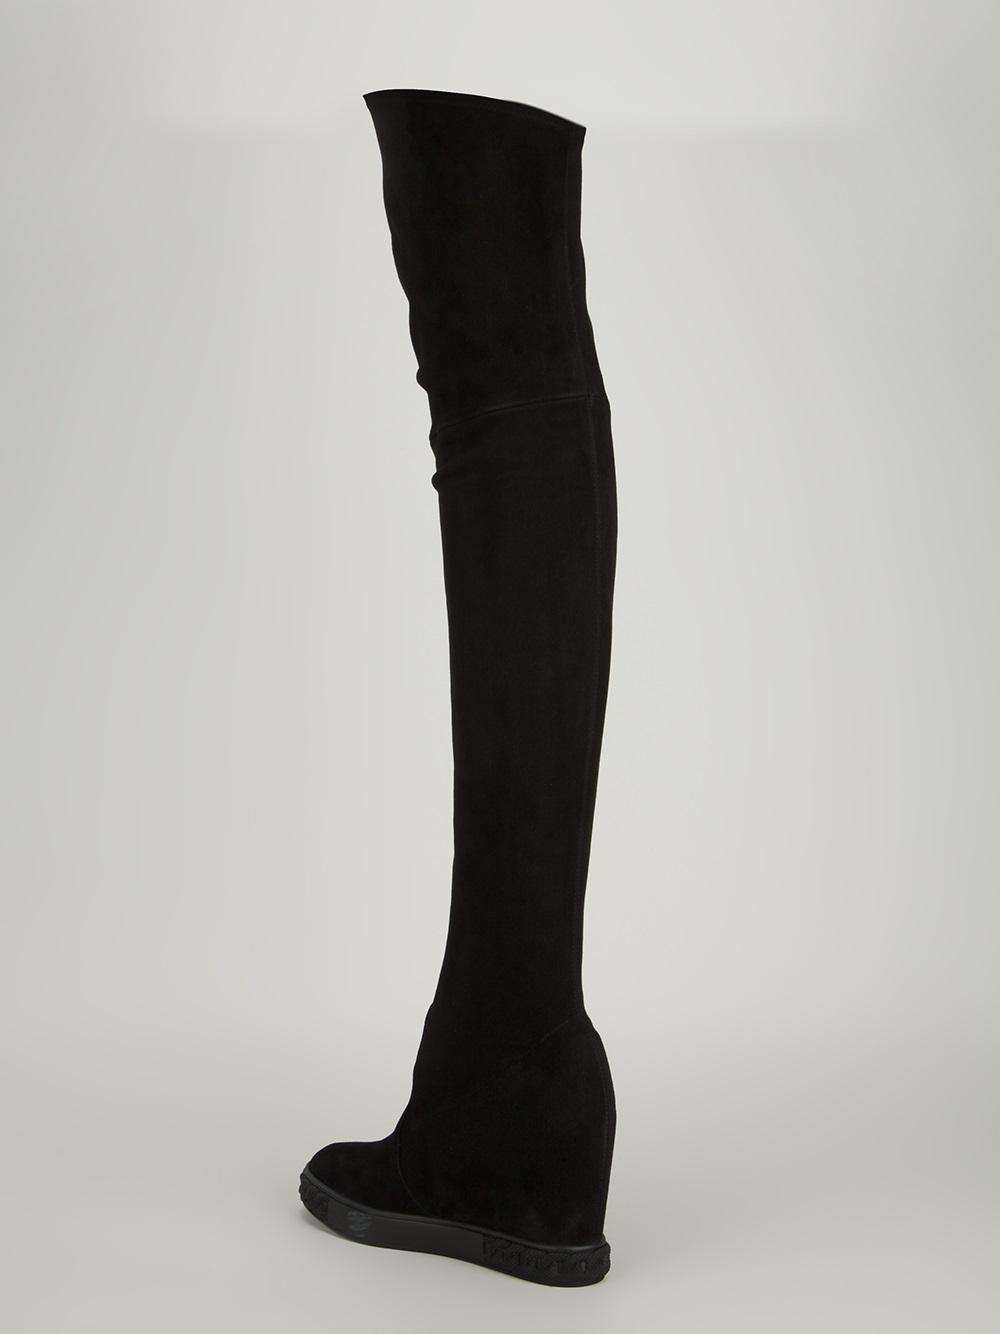 Casadei Wedge Knee-High Boots view cheap online buy cheap footlocker finishline cheap sale countdown package shopping online clearance kpBC9Dhq